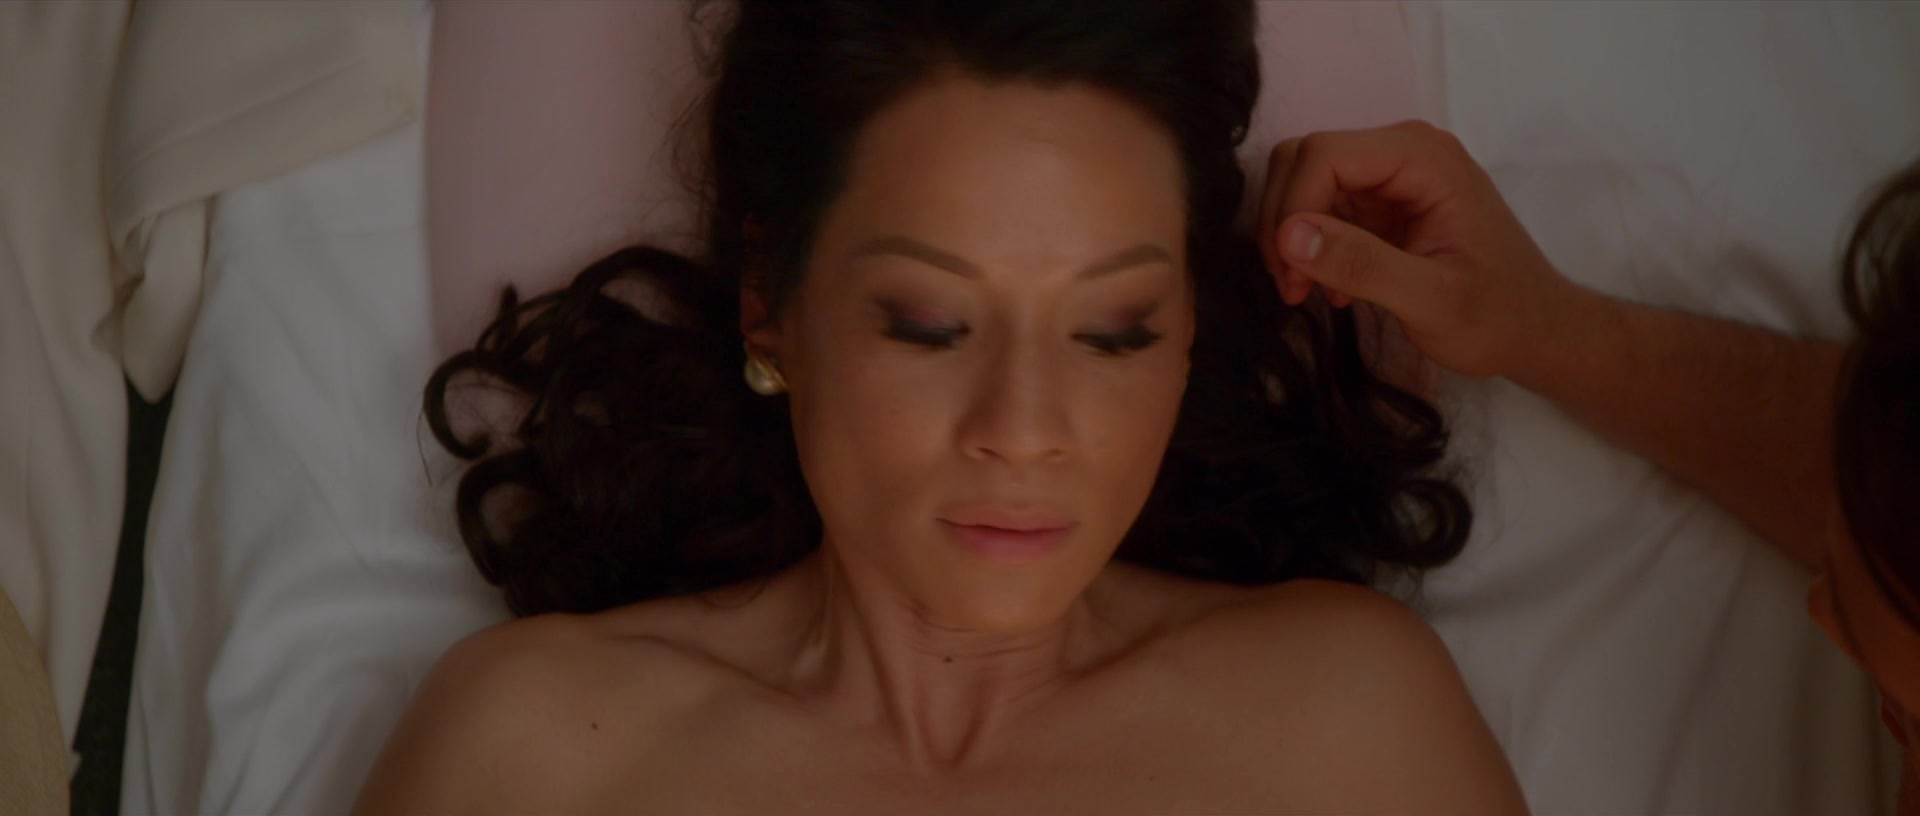 Alisa Tomei Porn lucy liu nude - why women kill s01e02 (2019) video » best